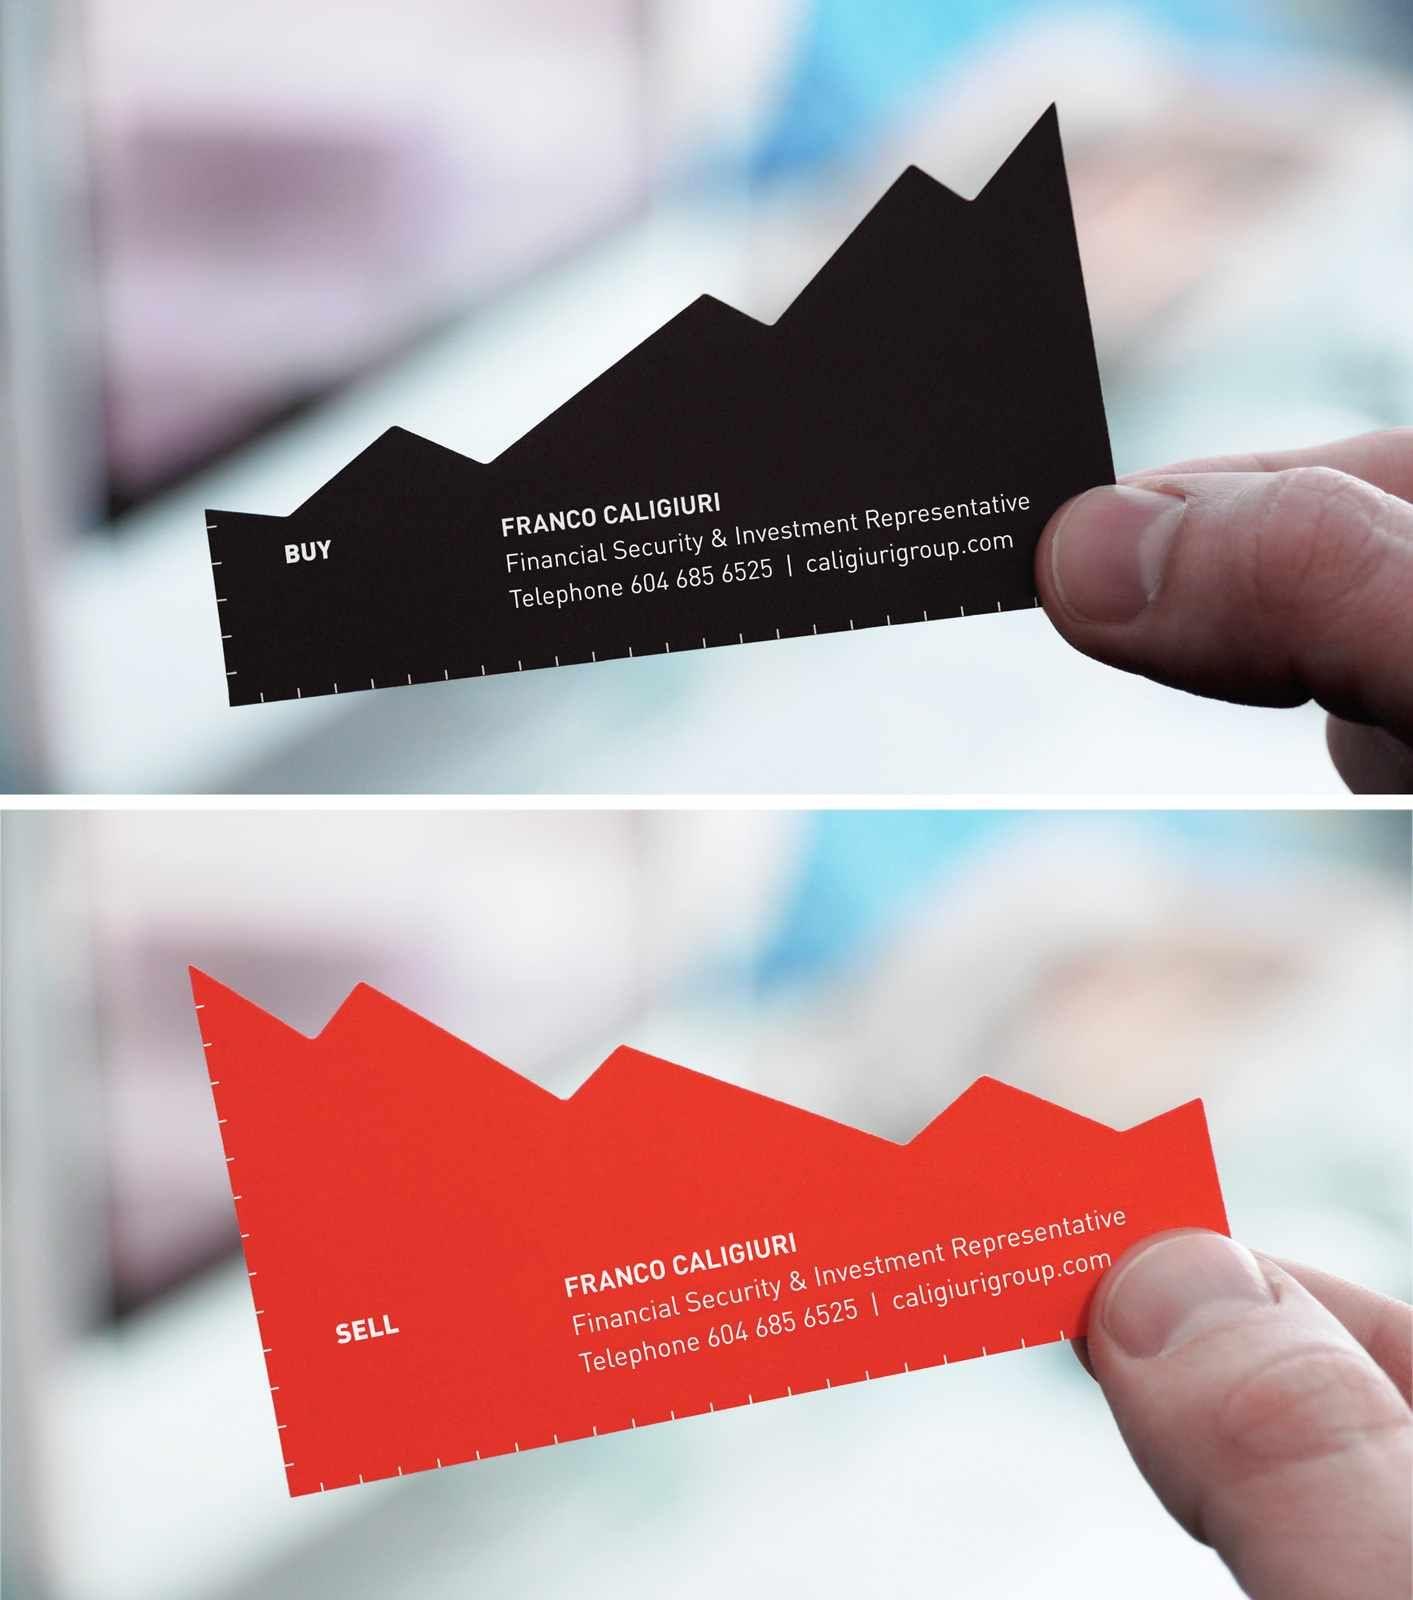 Franco Caligiuri Financial & Investment Representative: Chart business card